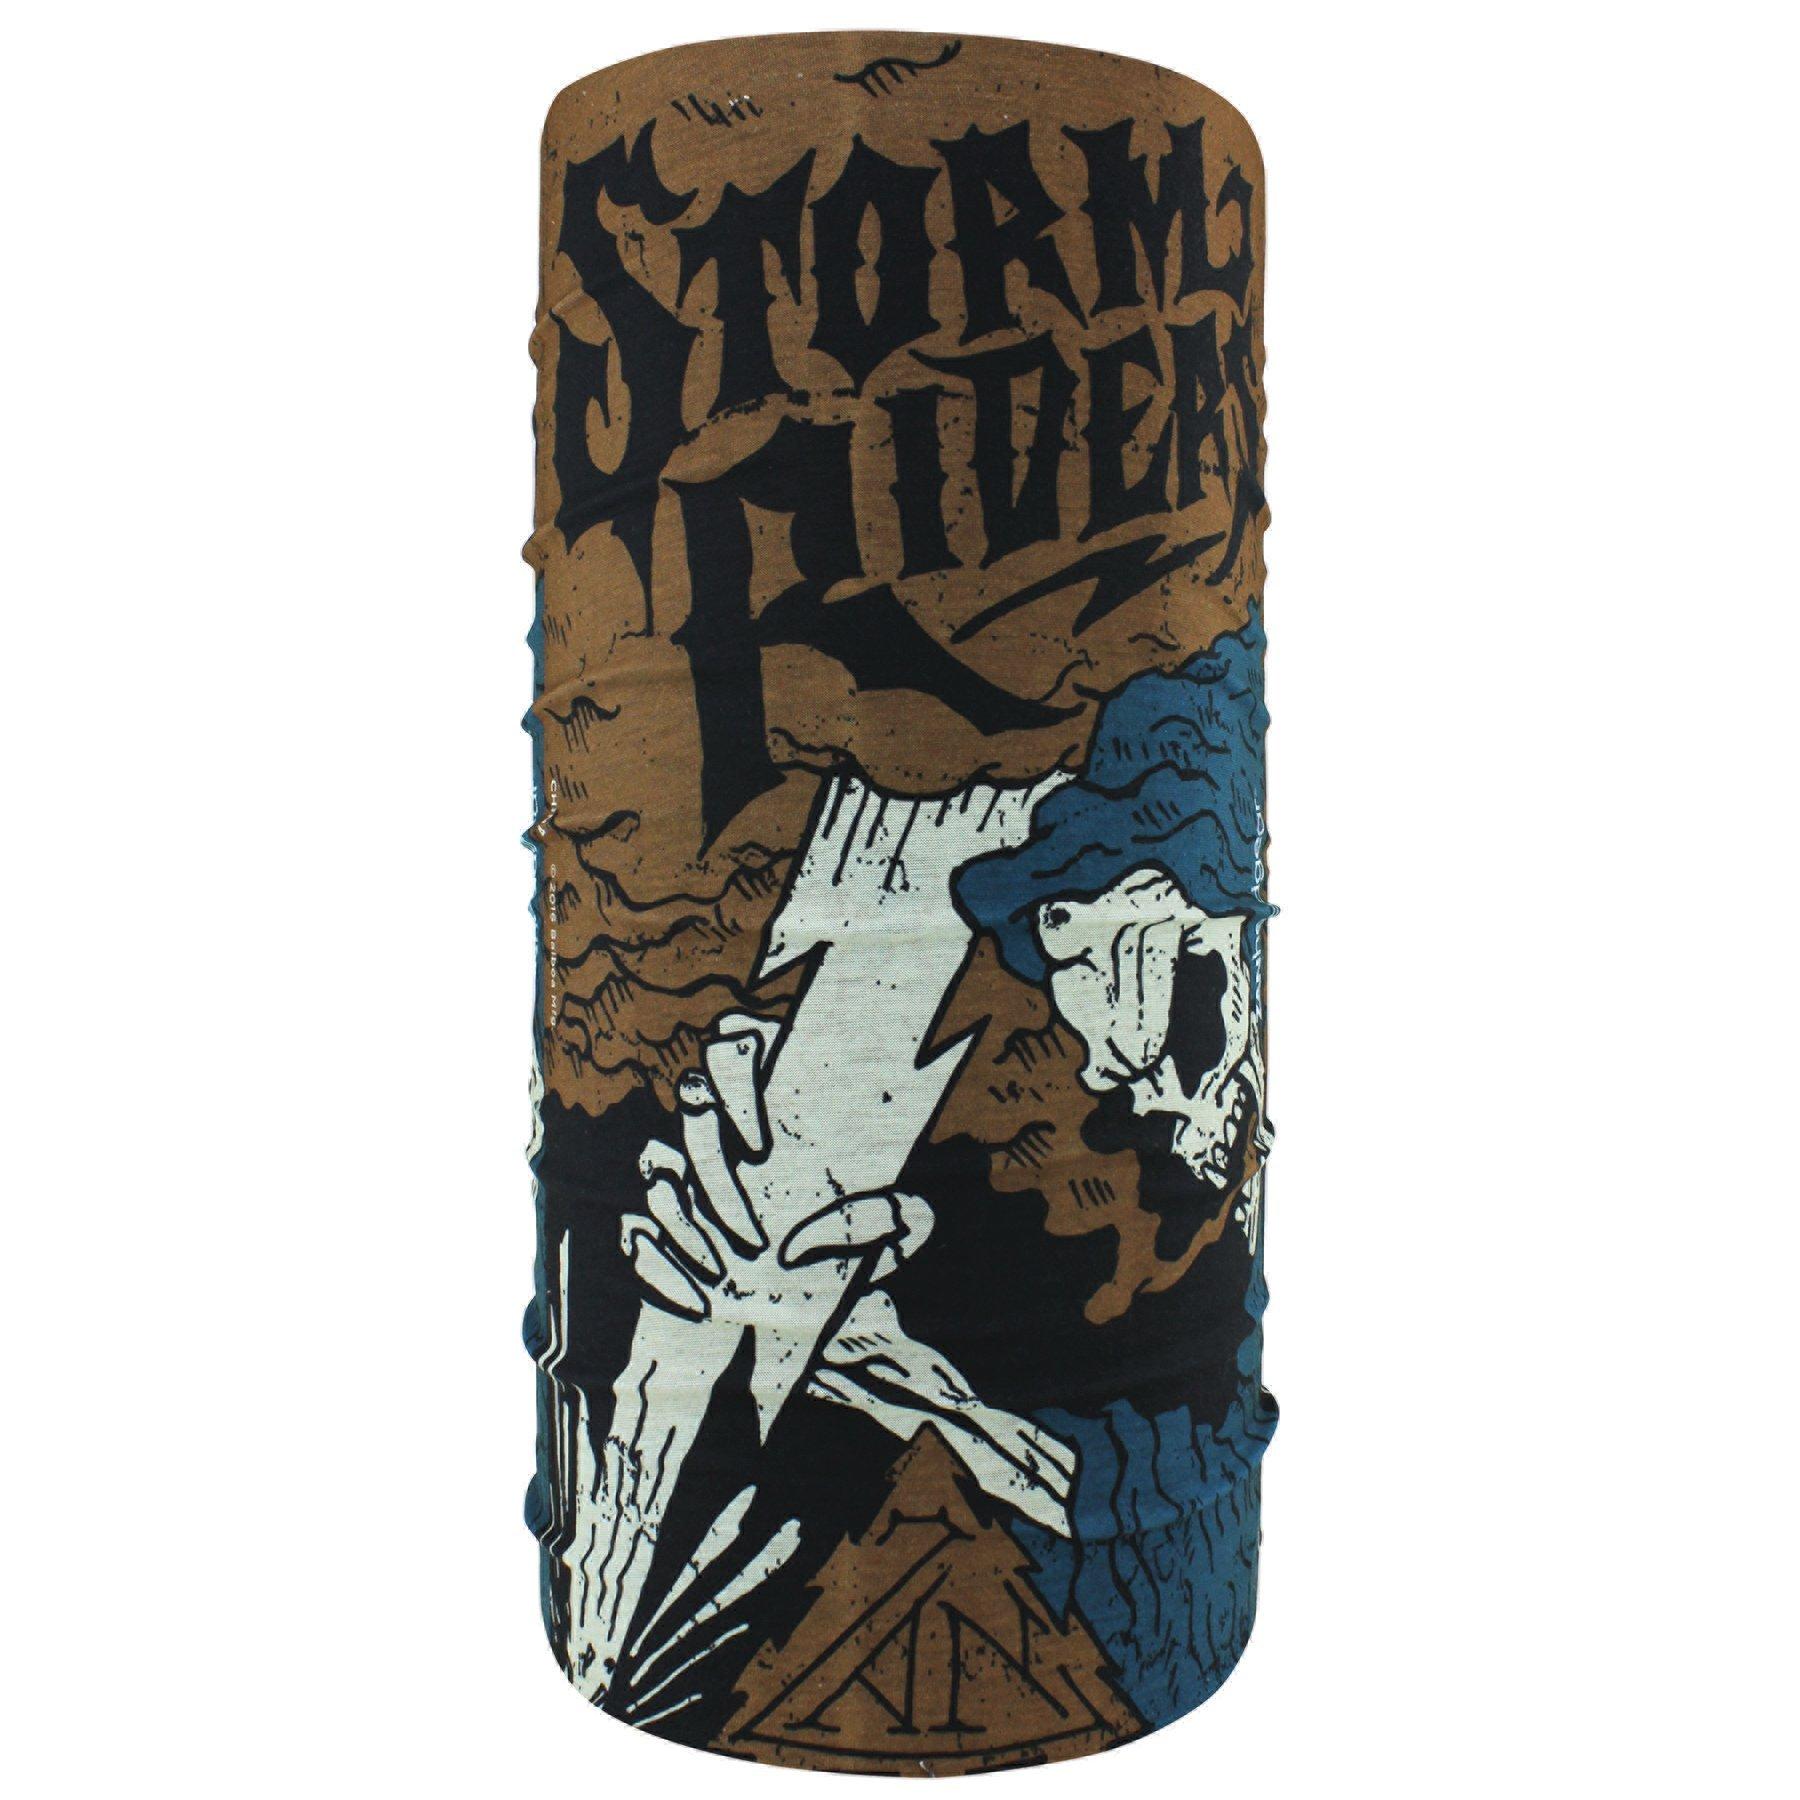 Zanheadgear T253 Motley Tube, 100% Polyester, Storm Reaper